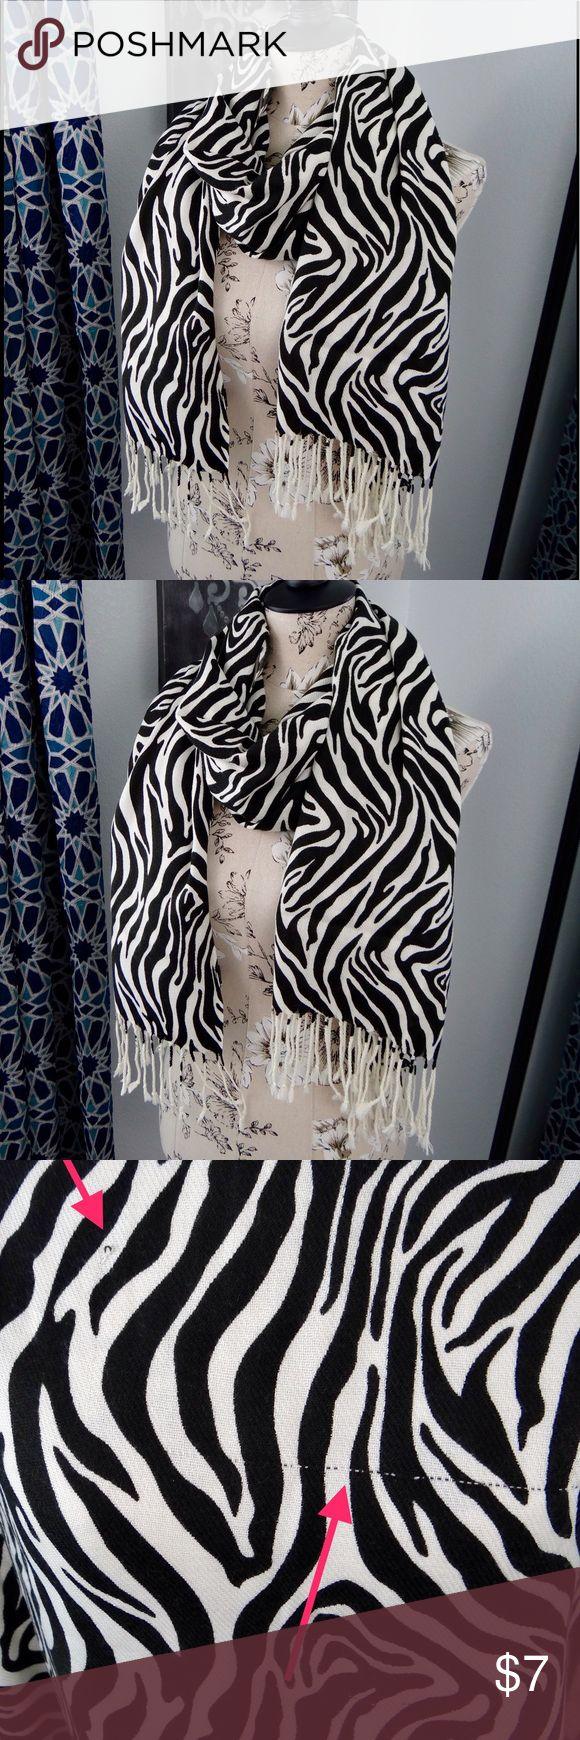 Grace Adele zebra scarf Grace Adele zebra scarf Grace Adele Accessories Scarves & Wraps